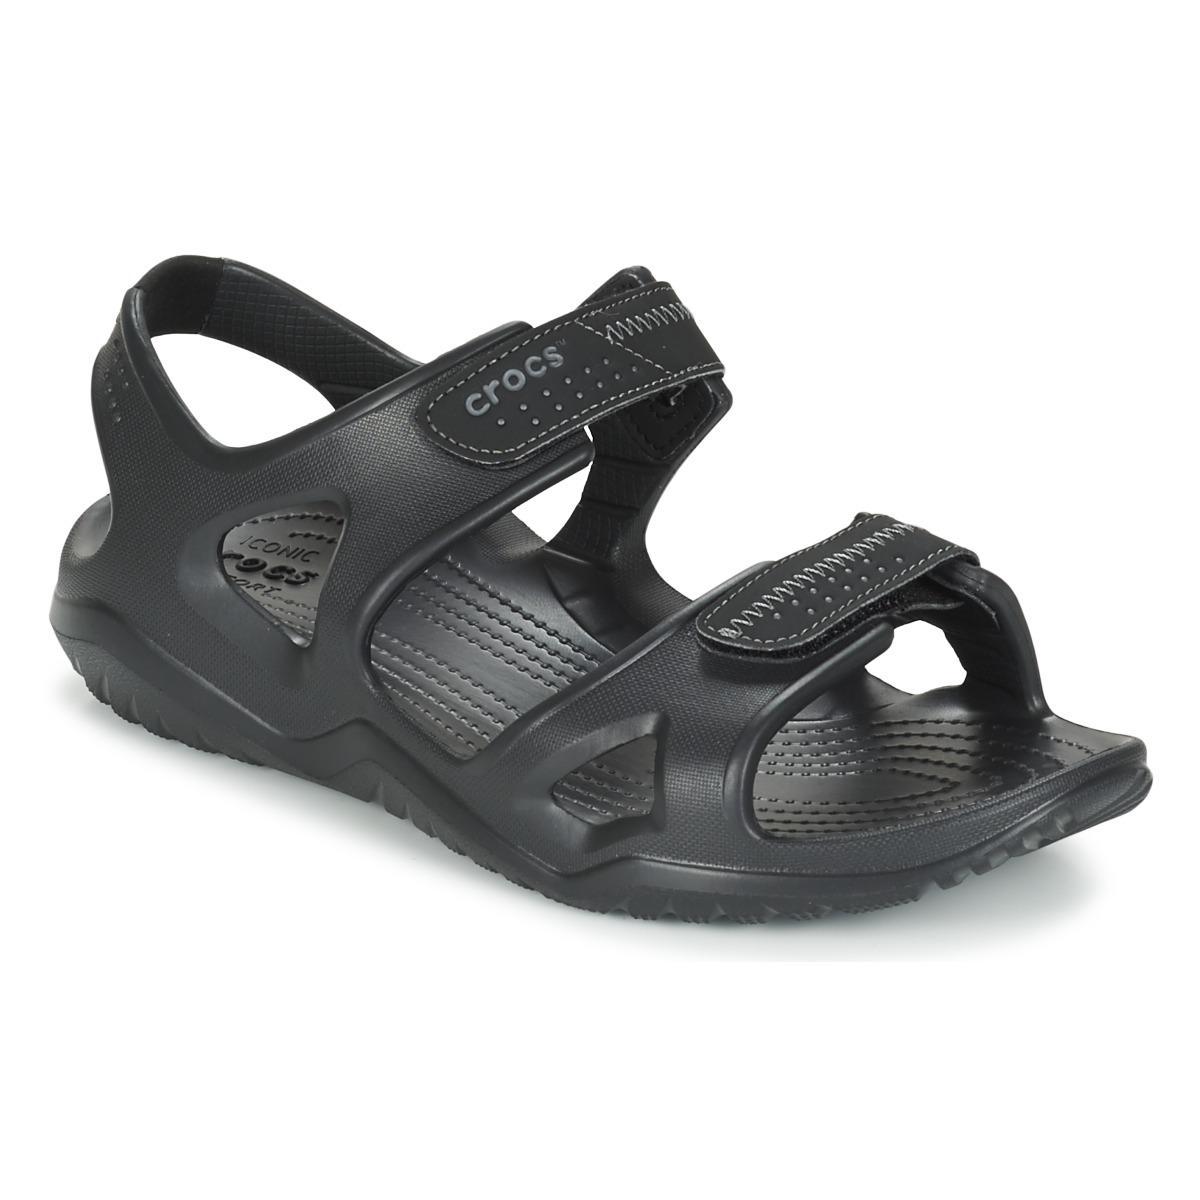 124a82fd88b Crocs™ Swiftwater River Sandal Sandals in Black for Men - Save 7% - Lyst